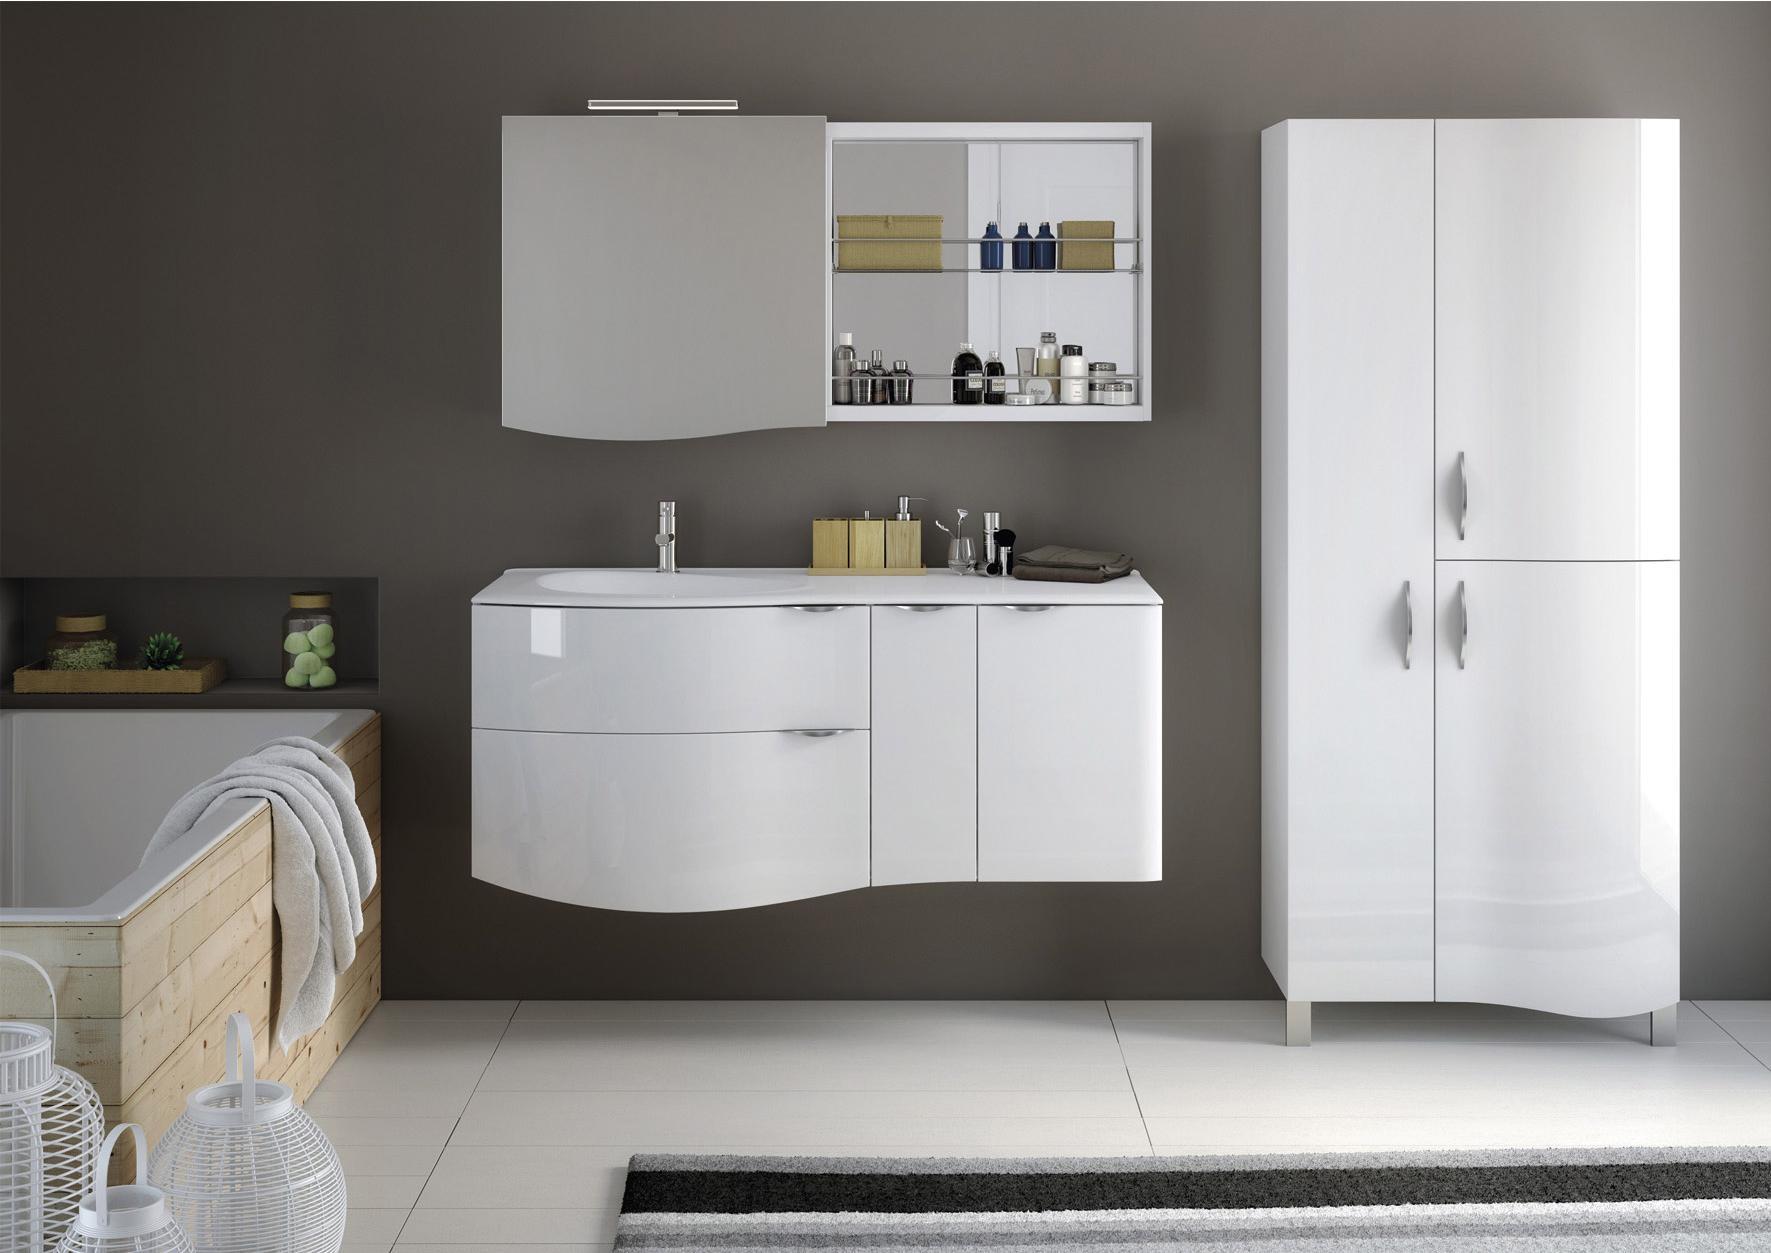 Meuble Vasque 100 Cm Blanc, Elegance | Leroy Merlin tout Vasque Leroy Merlin